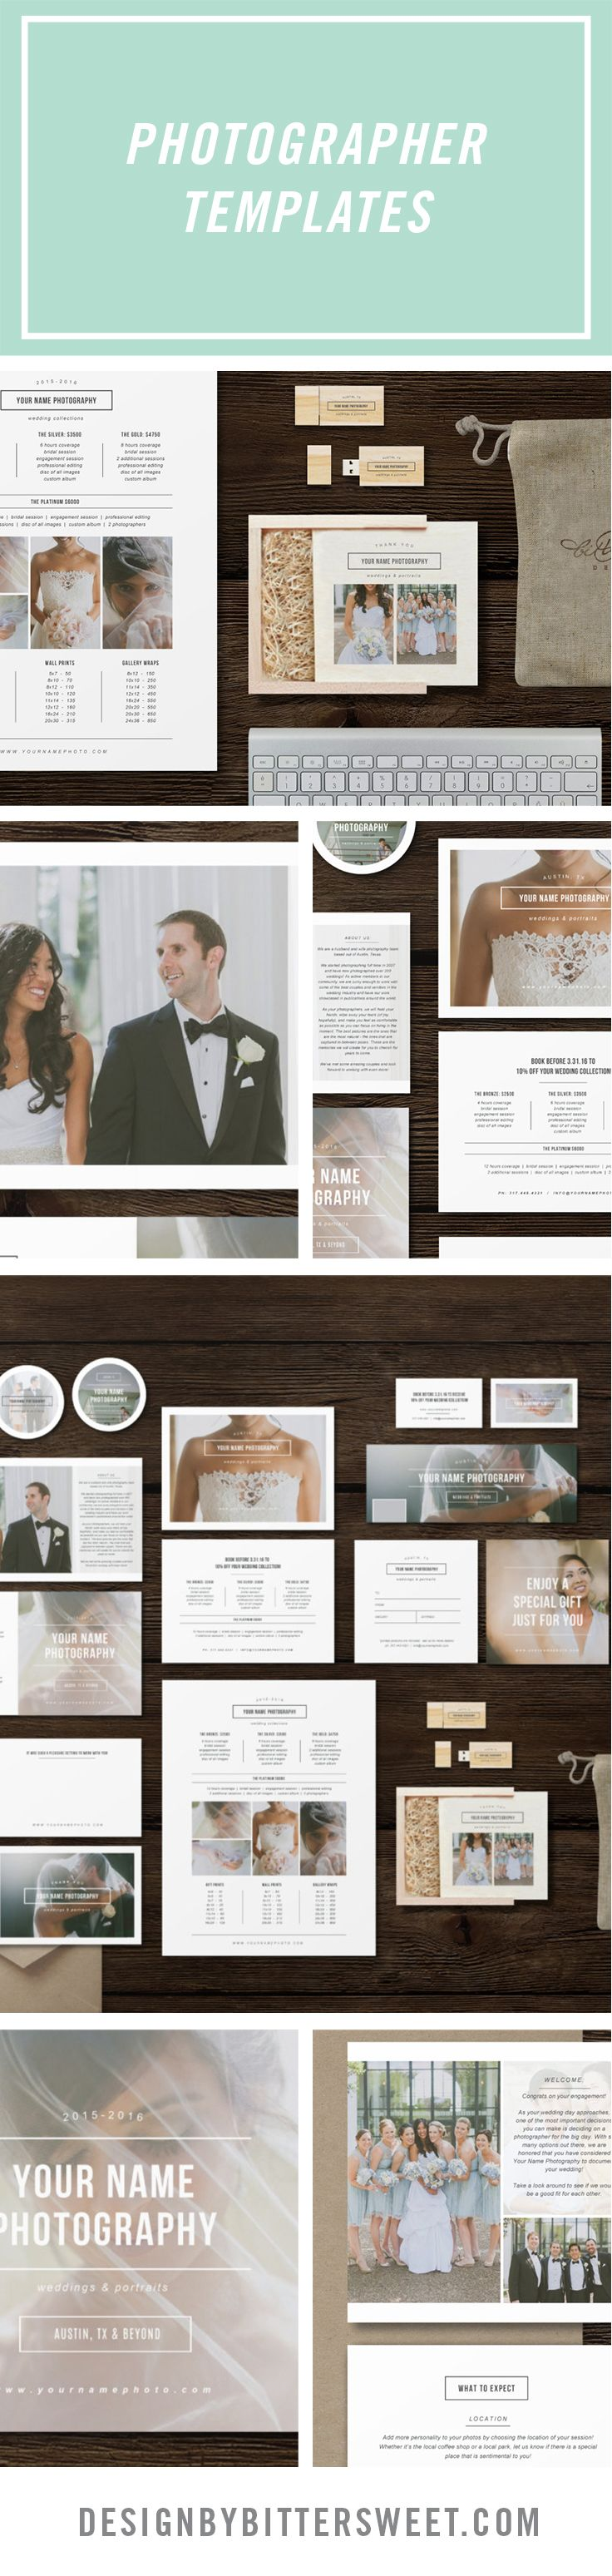 24 best Wedding Photography Marketing Sets. images on Pinterest ...